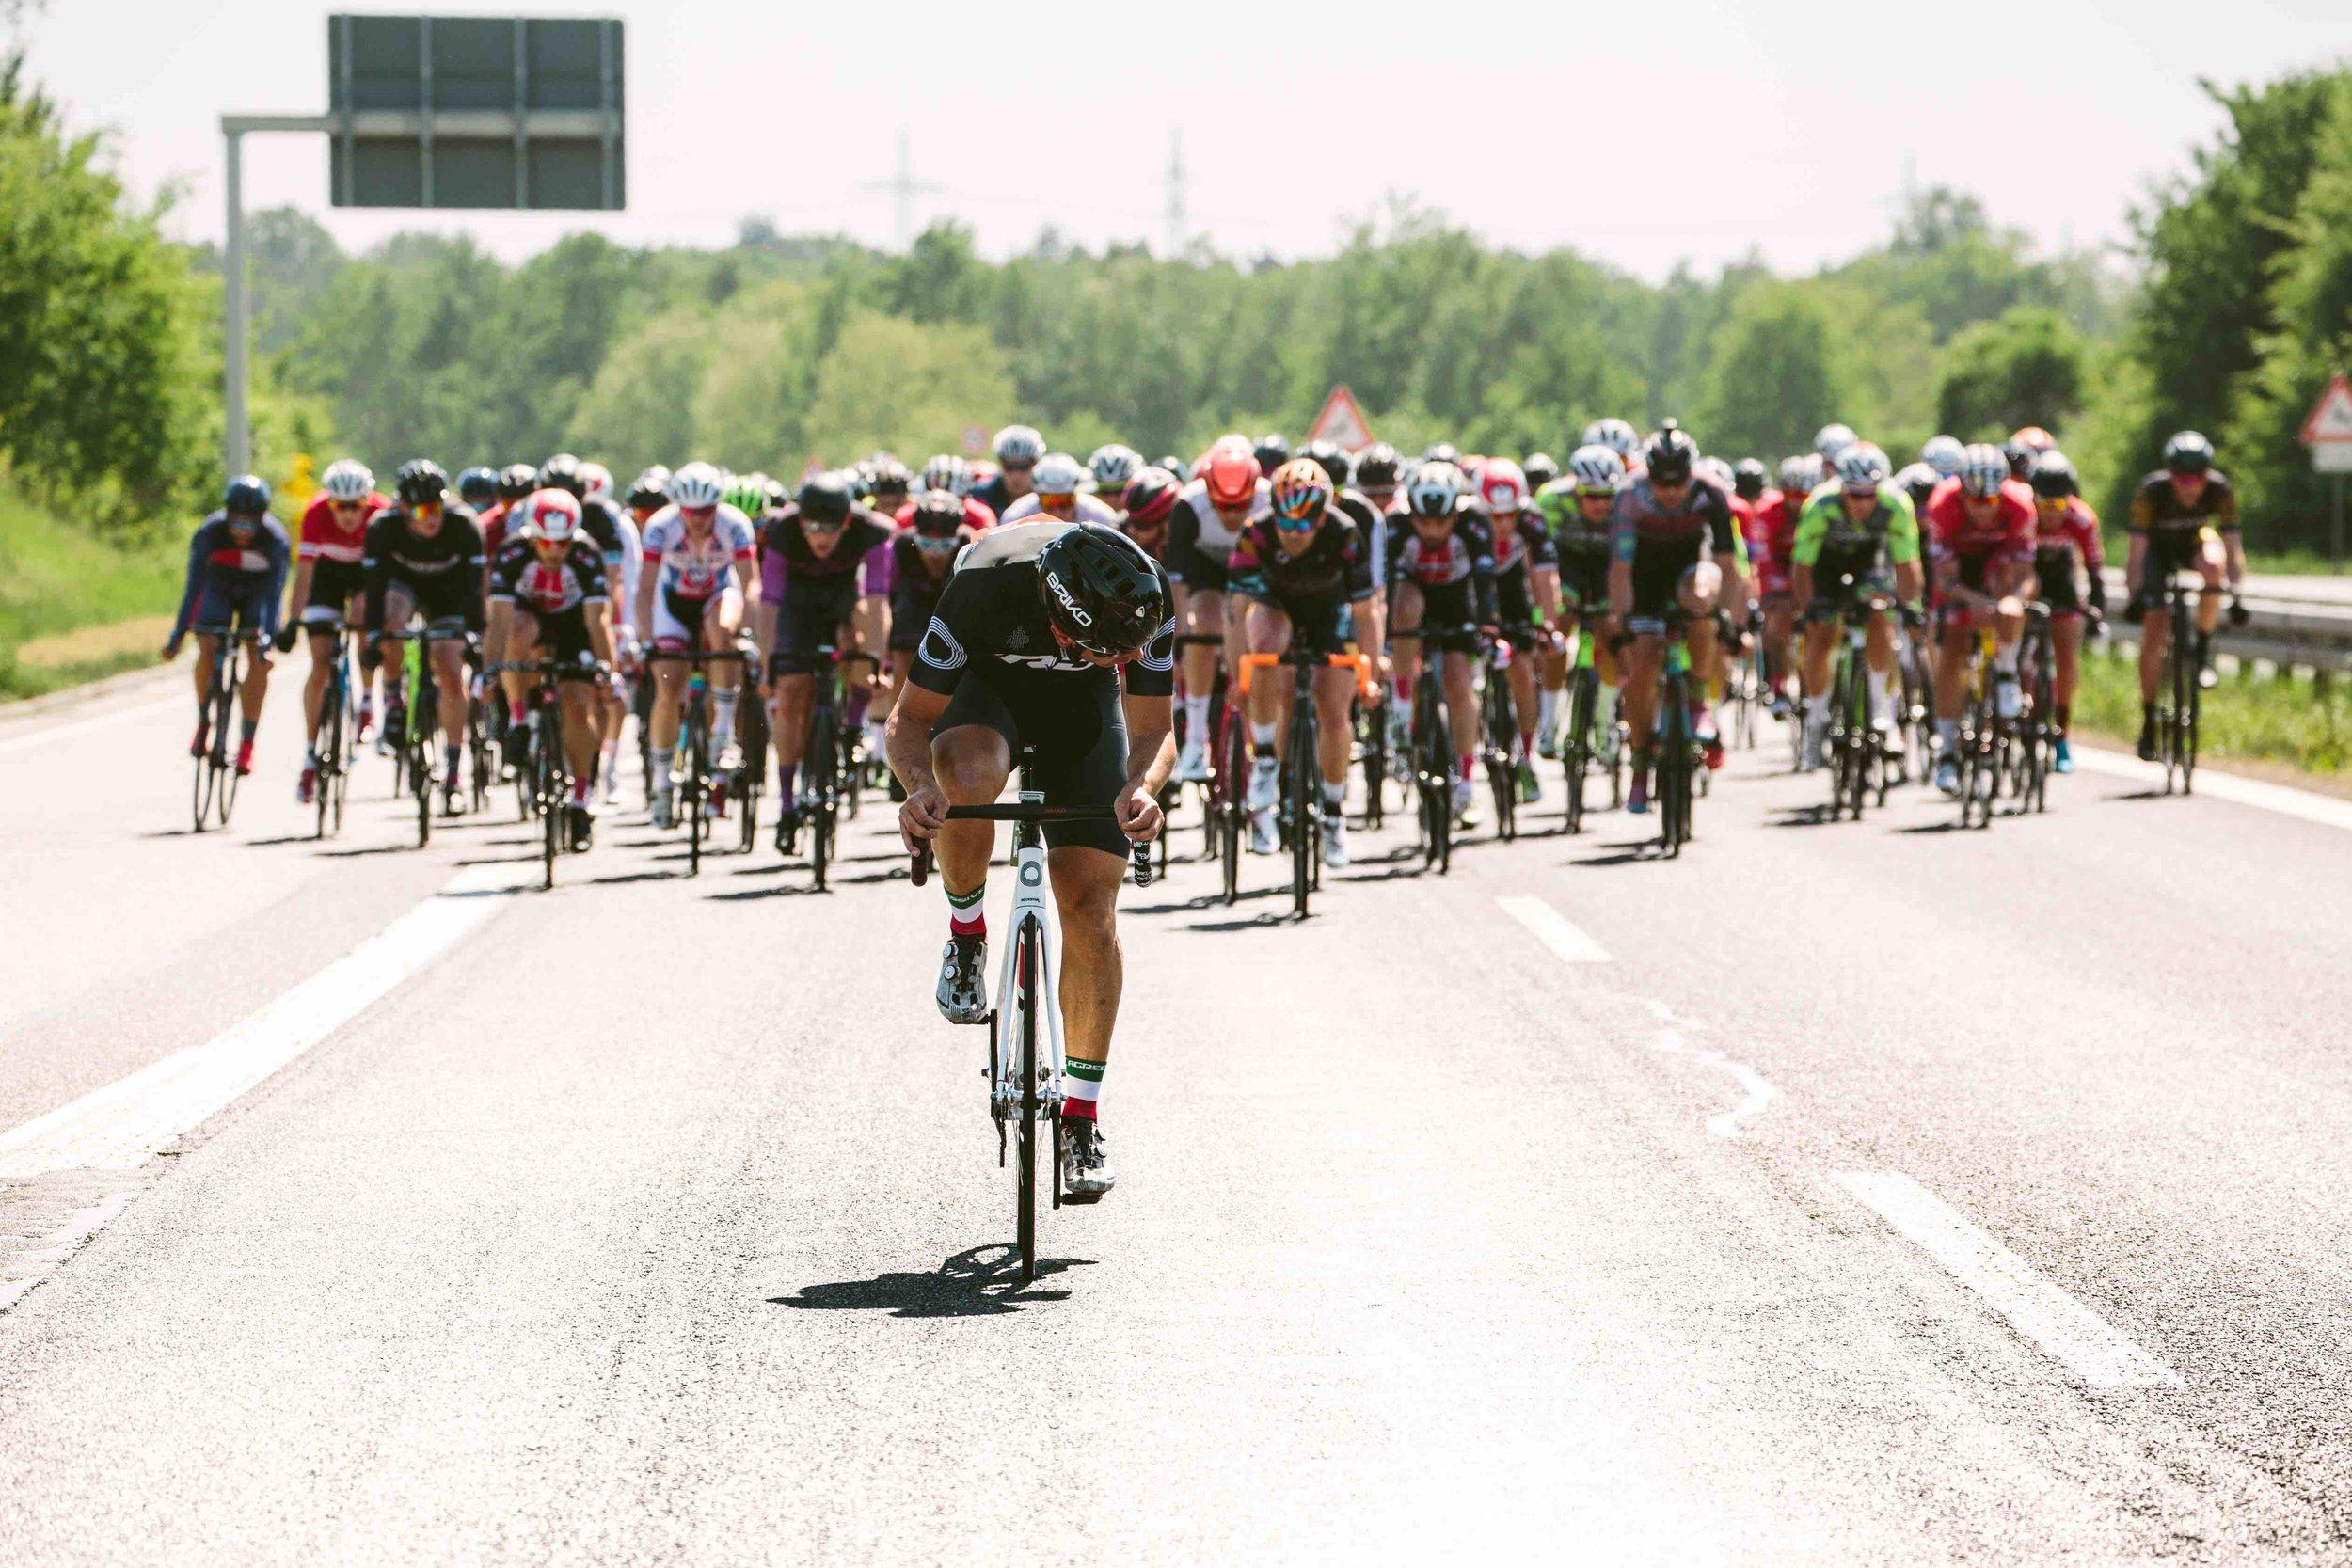 RadRace_Fixed42_Raceday_BengtStiller-0900.jpeg